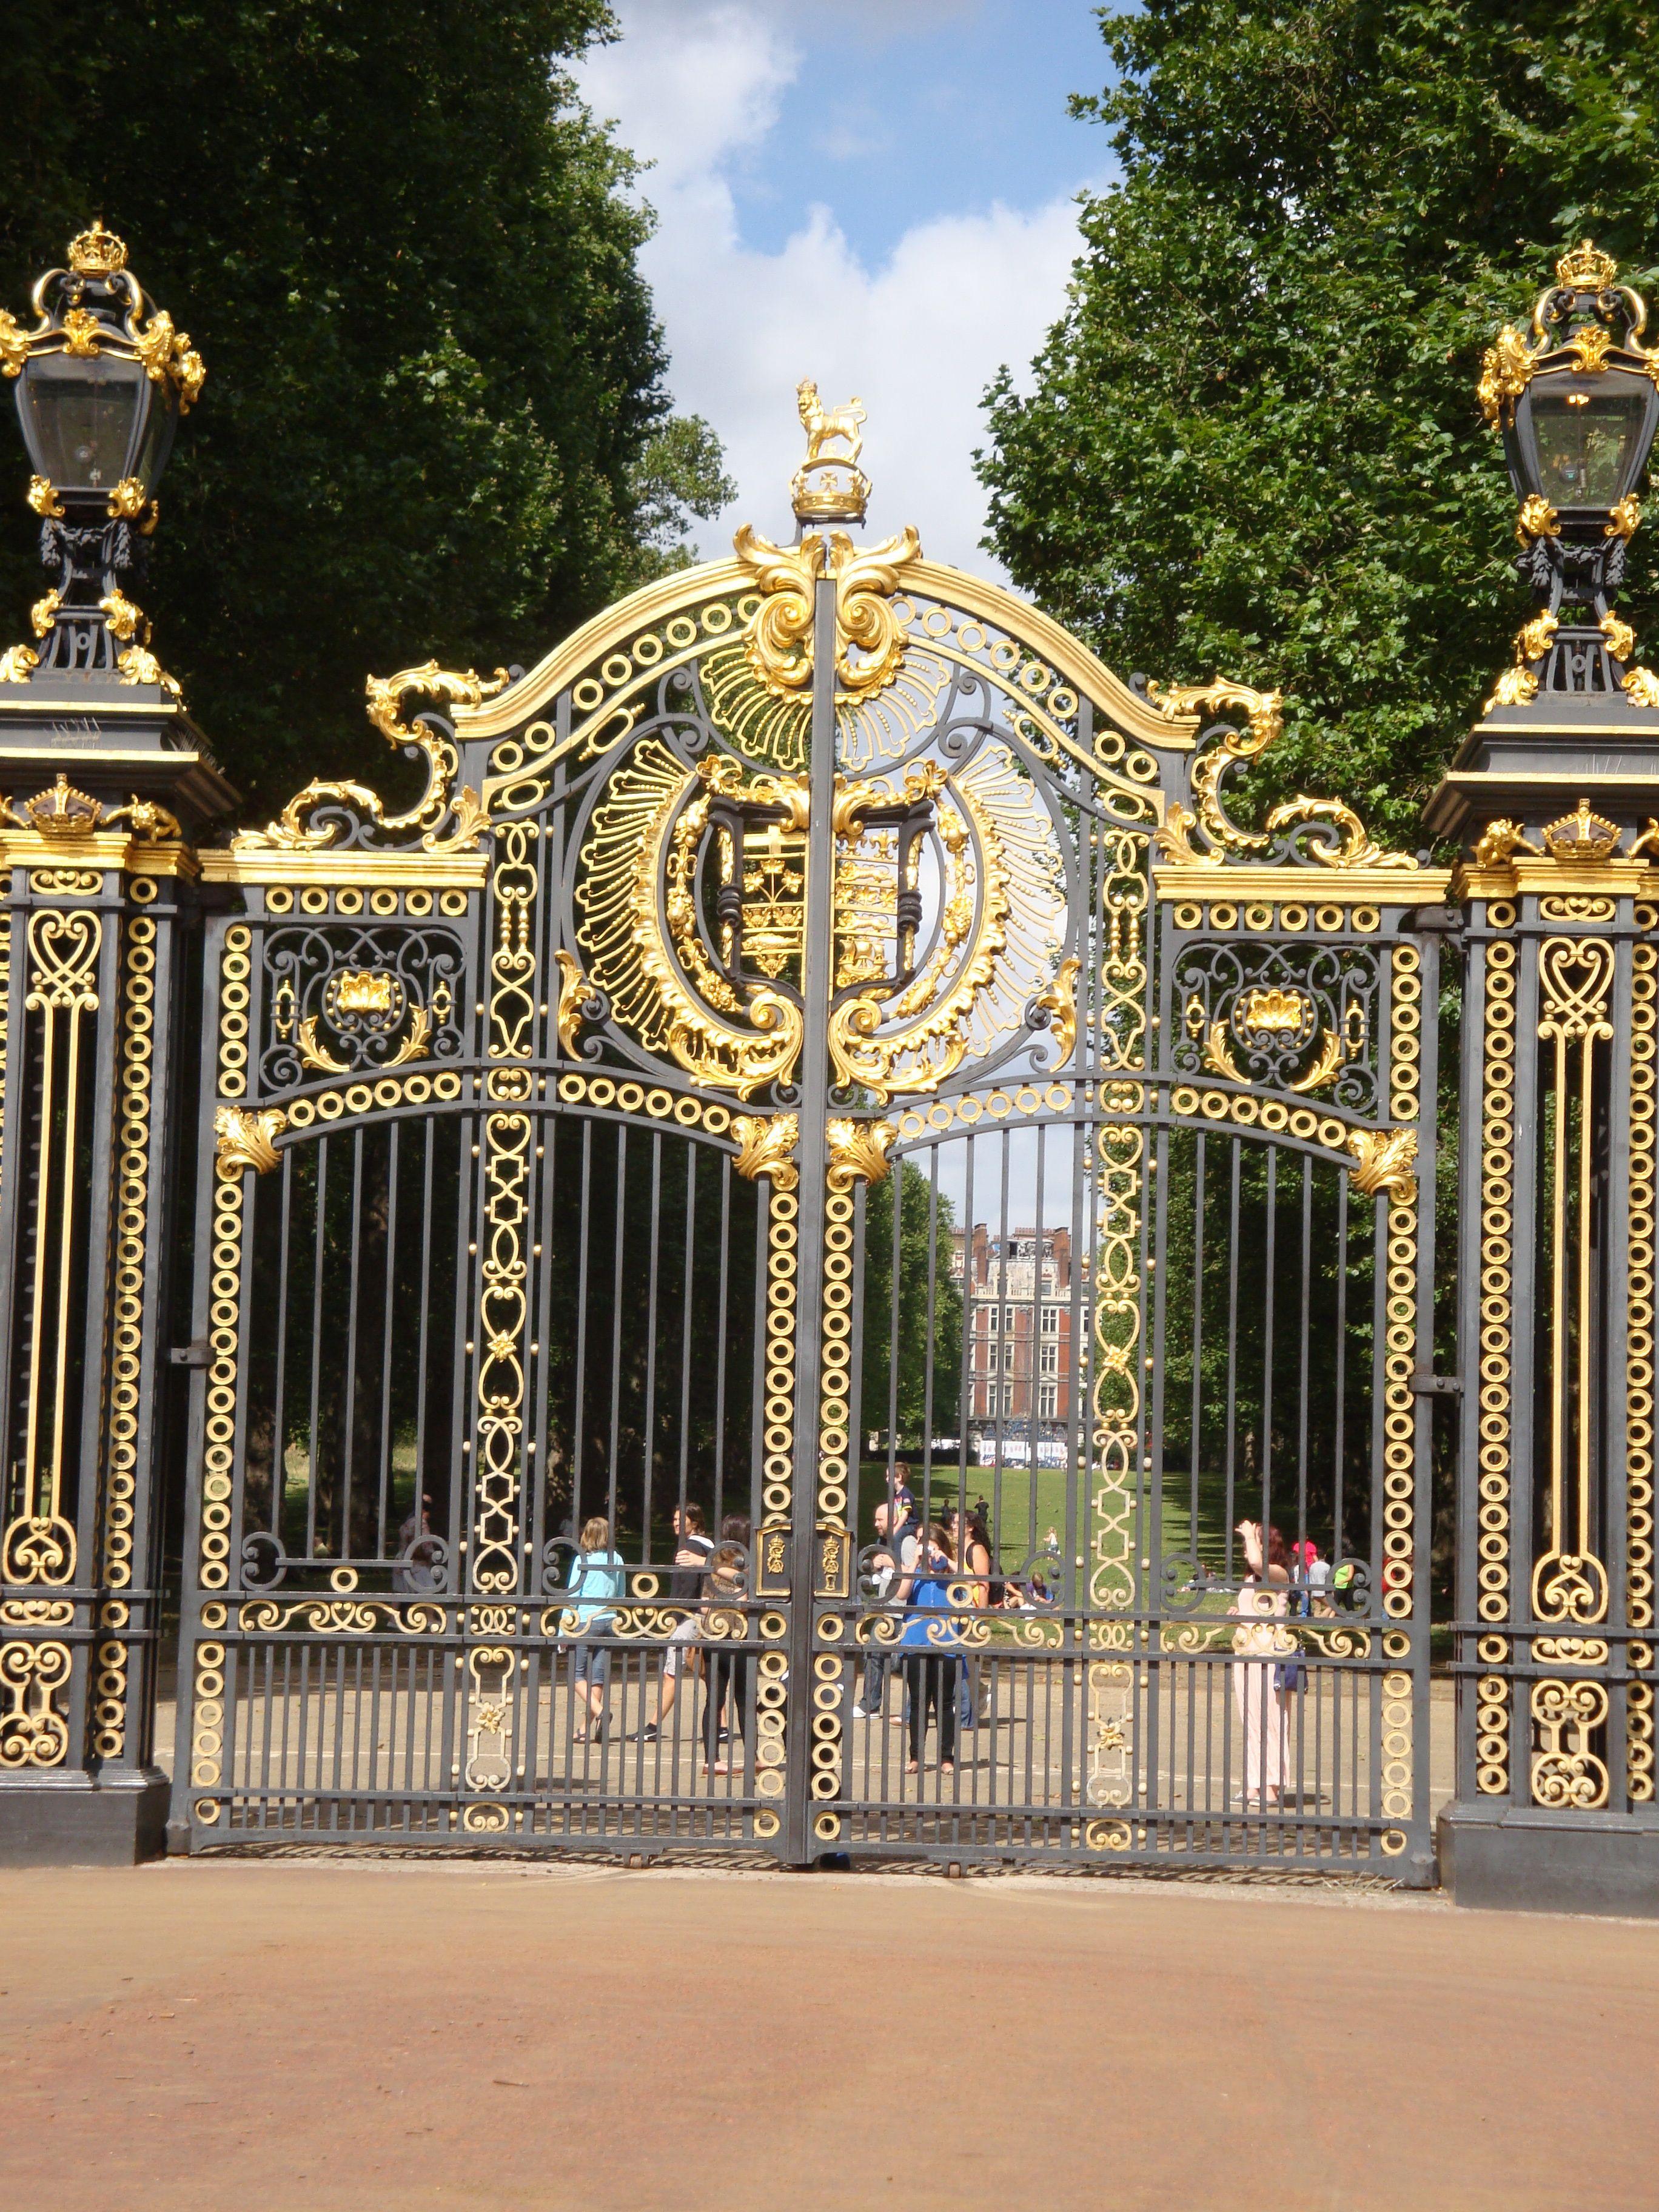 Pin By Sarah Veith On London Greatness London Park Buckingham Palace Dream City